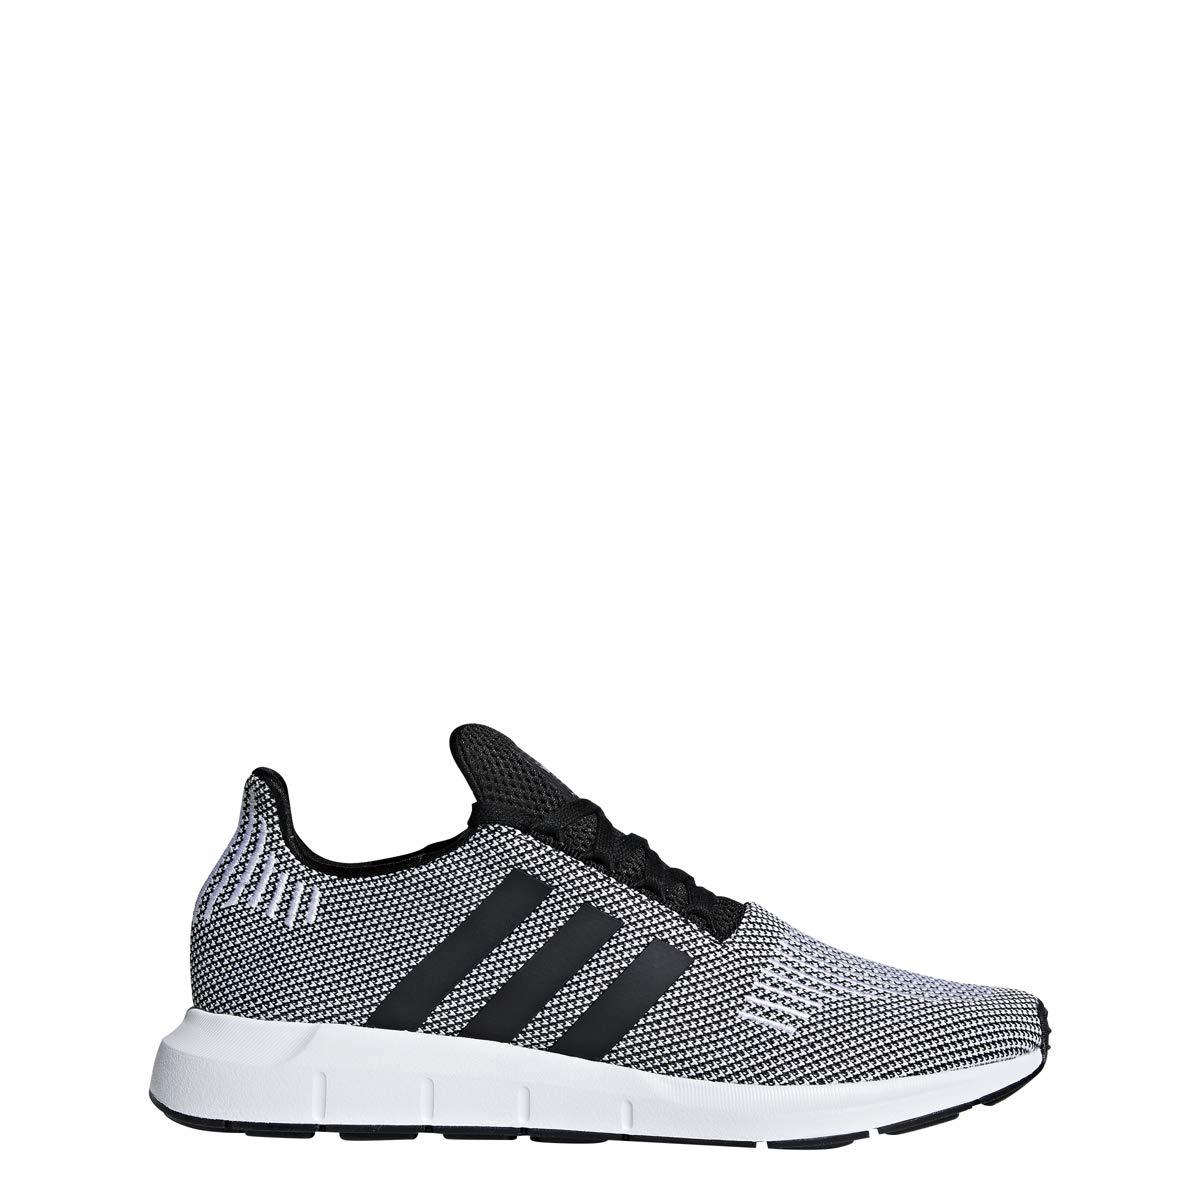 a99b34dc3153c Galleon - Adidas Originals Men's Swift Running Shoes (12 D(M) US ...